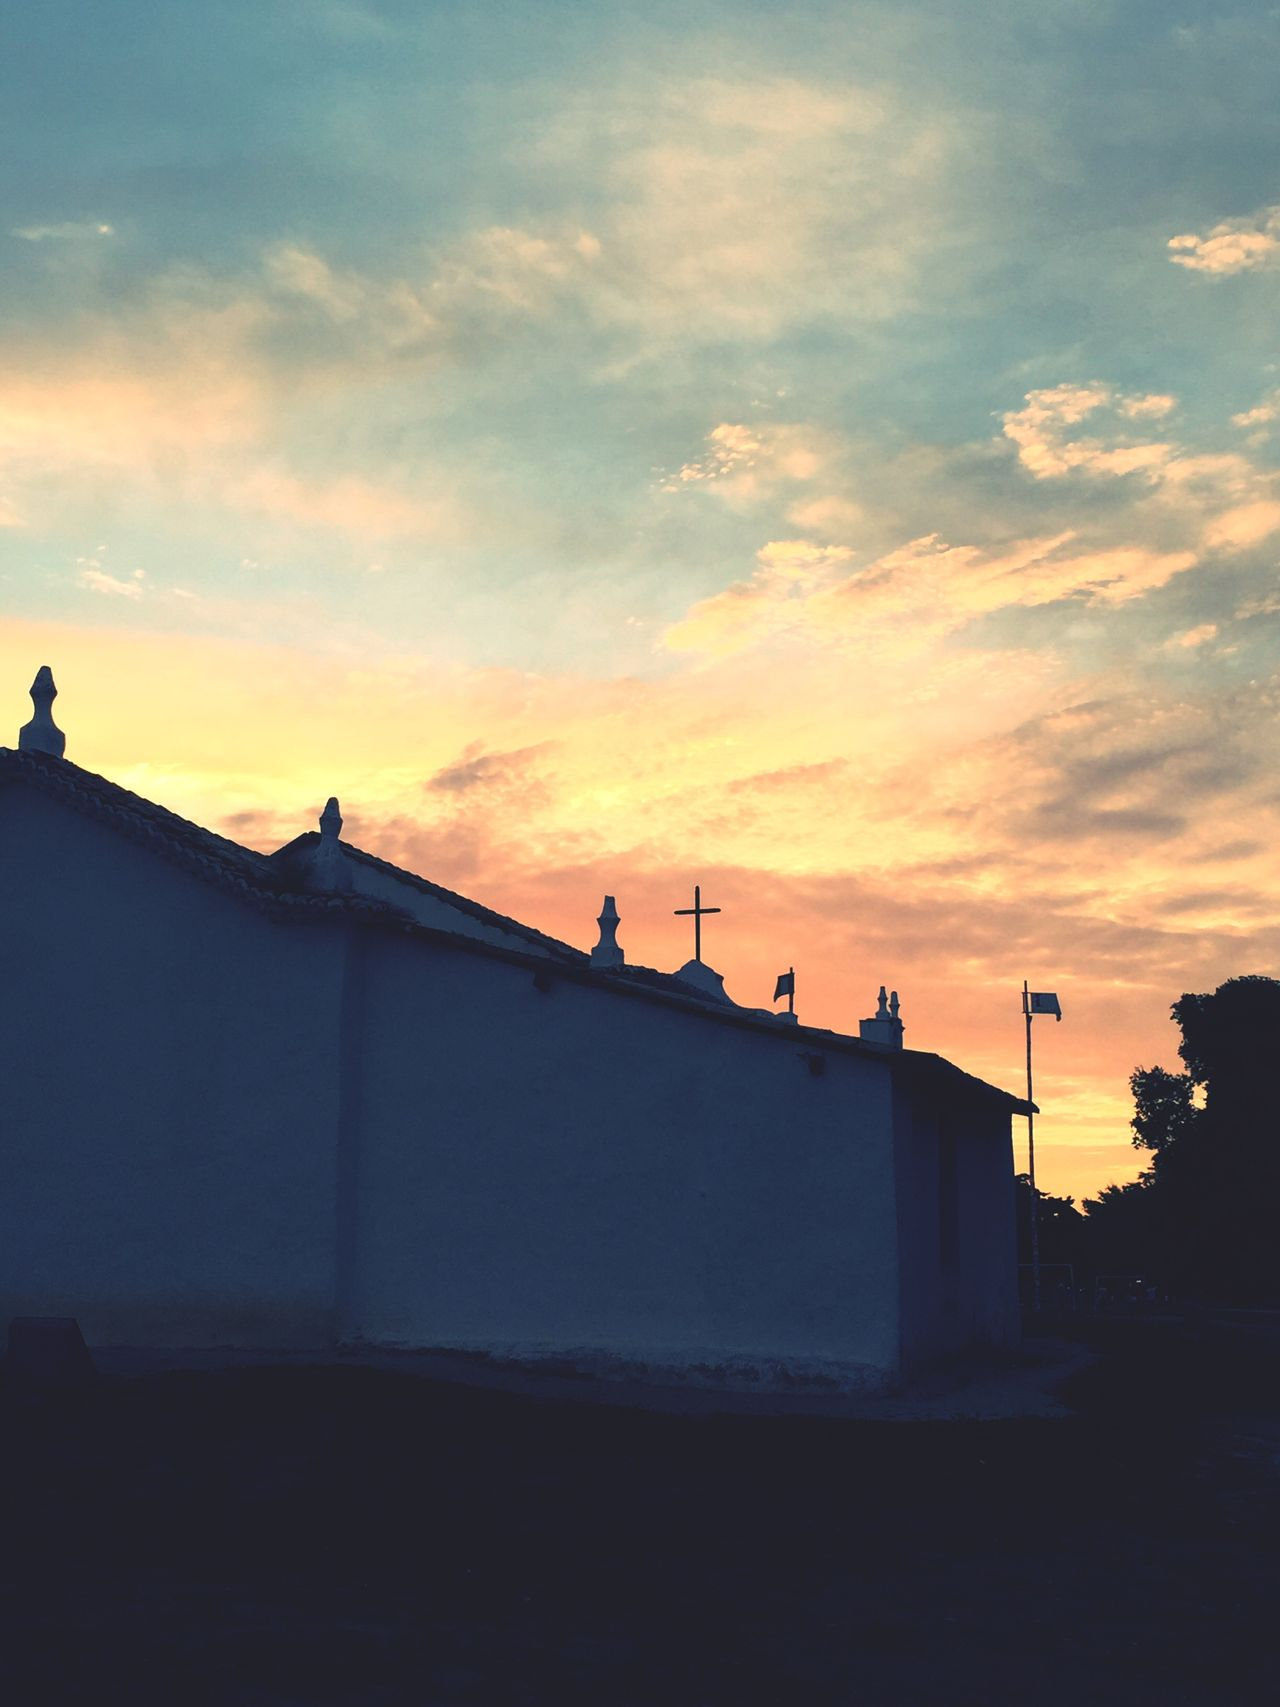 Church Trancoso - BA Sunset #sun #clouds #skylovers #sky #nature #beautifulinnature #naturalbeauty #photography #landscape